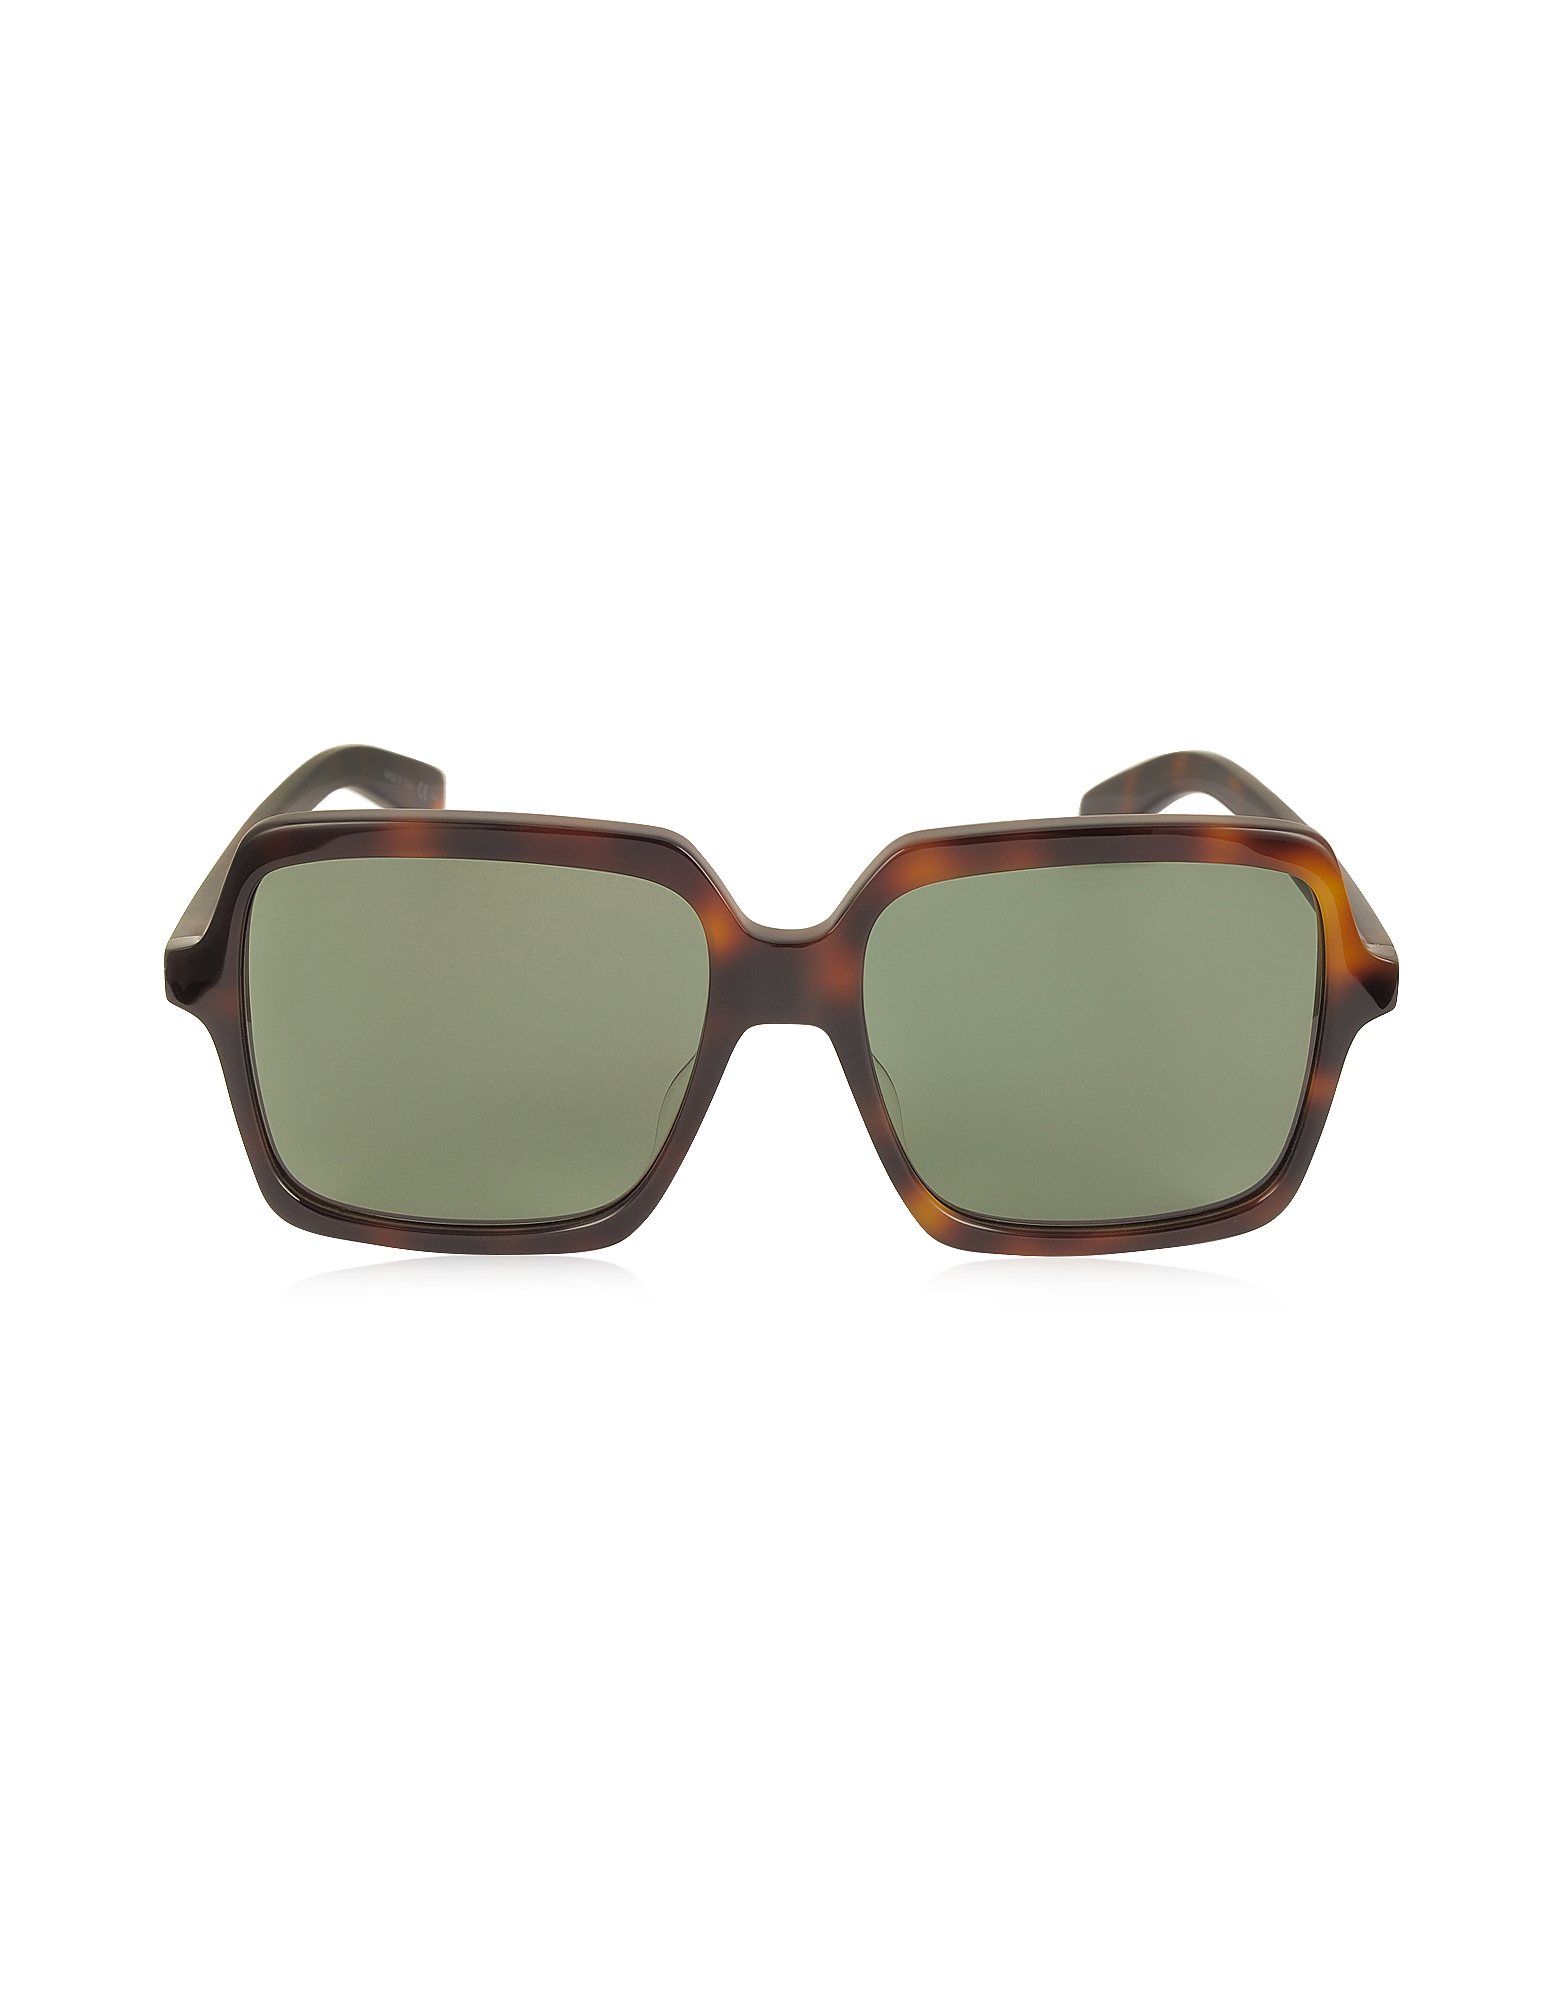 Saint Laurent Sunglasses, SL 174 Acetate Square-Frame Women's Sunglasses